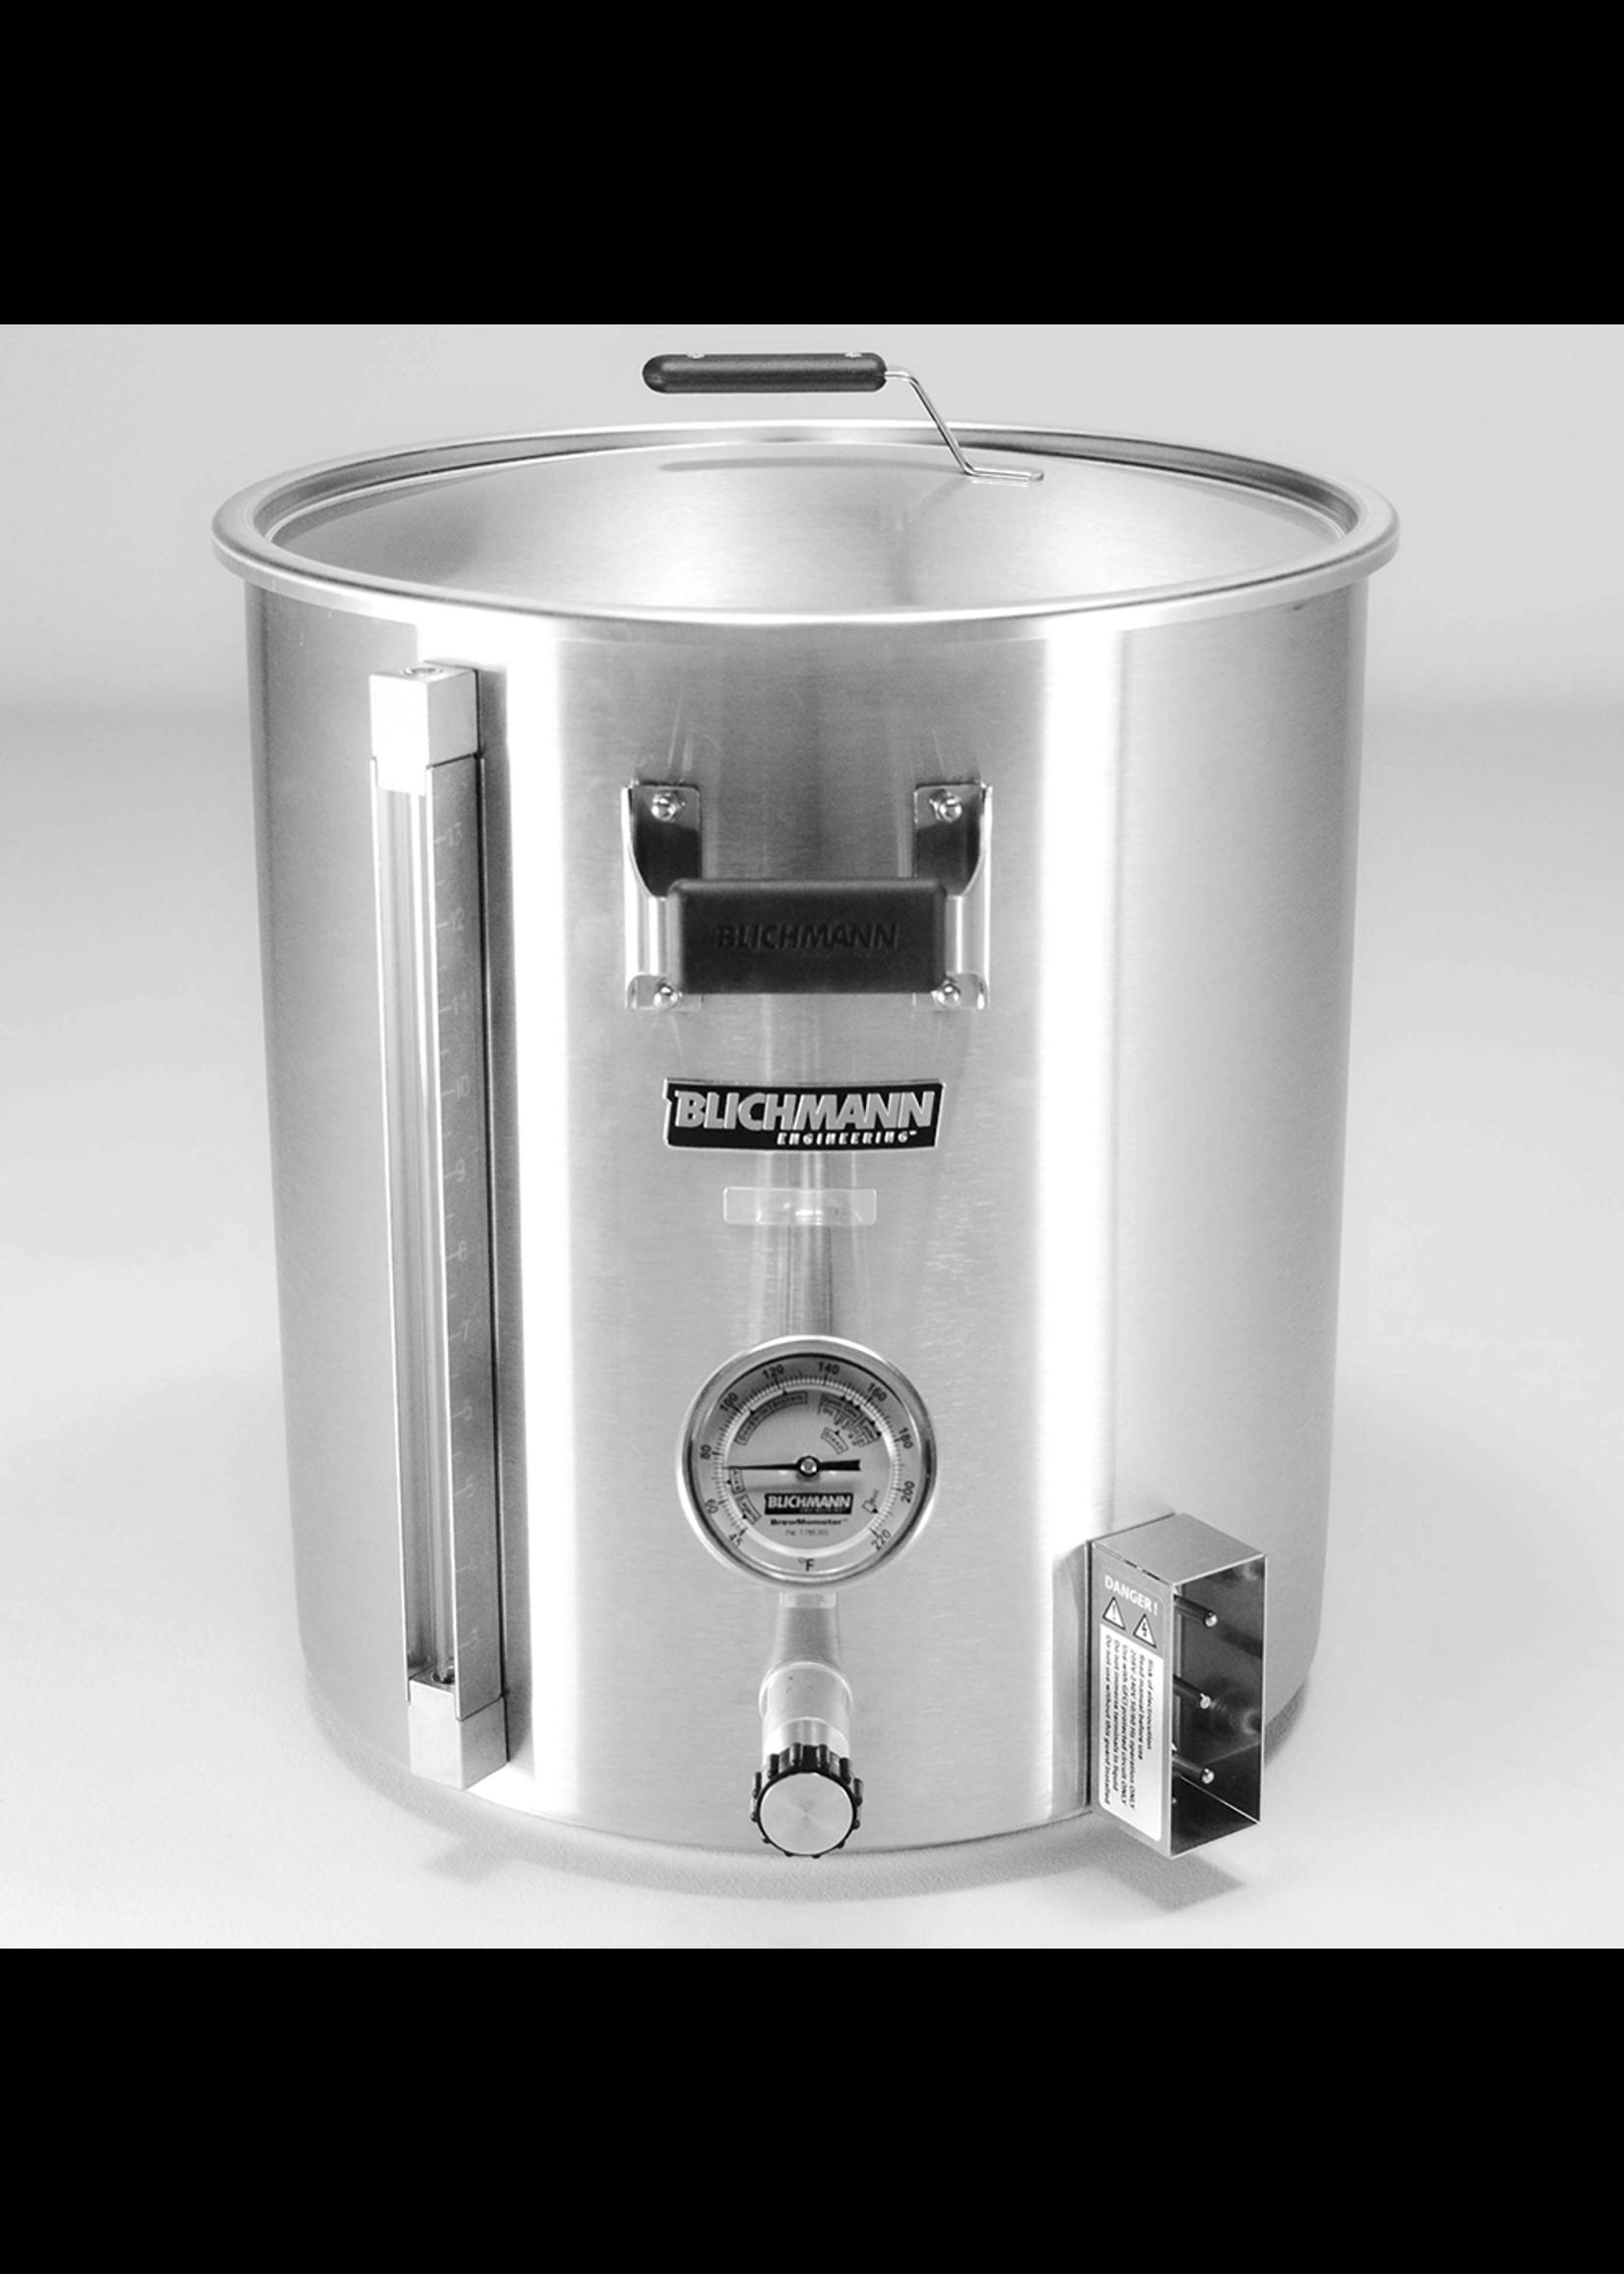 Blichmann Blichmann BoilerMaker G2 - 55 Gallon 240V Electric Brew Kettle (Fahrenheit)